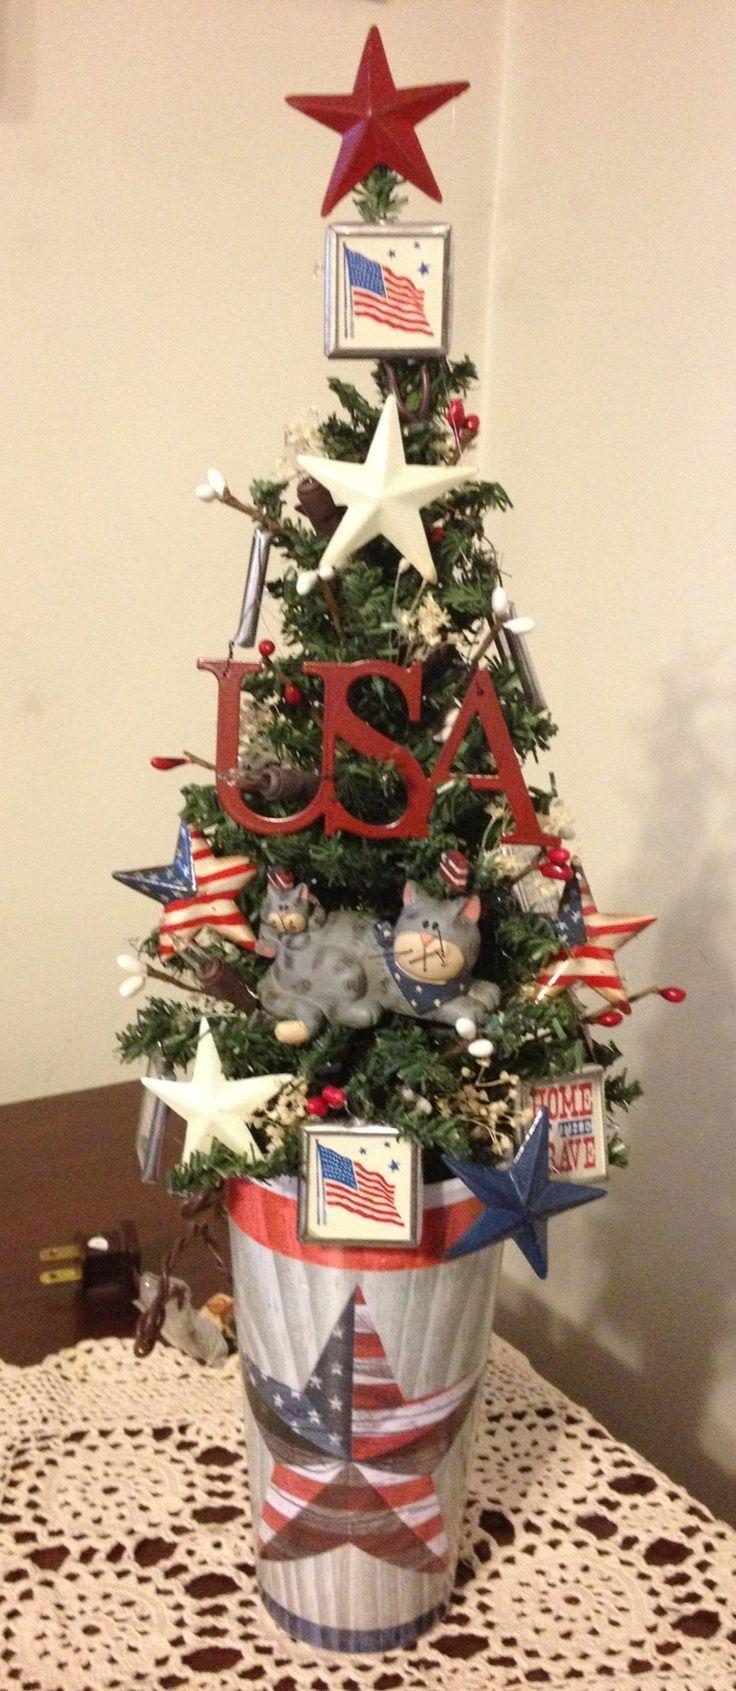 Americana Crafts 12 Lighted Americana Theme Tree Americana Crafts Americana Decor Patriotic Decorations